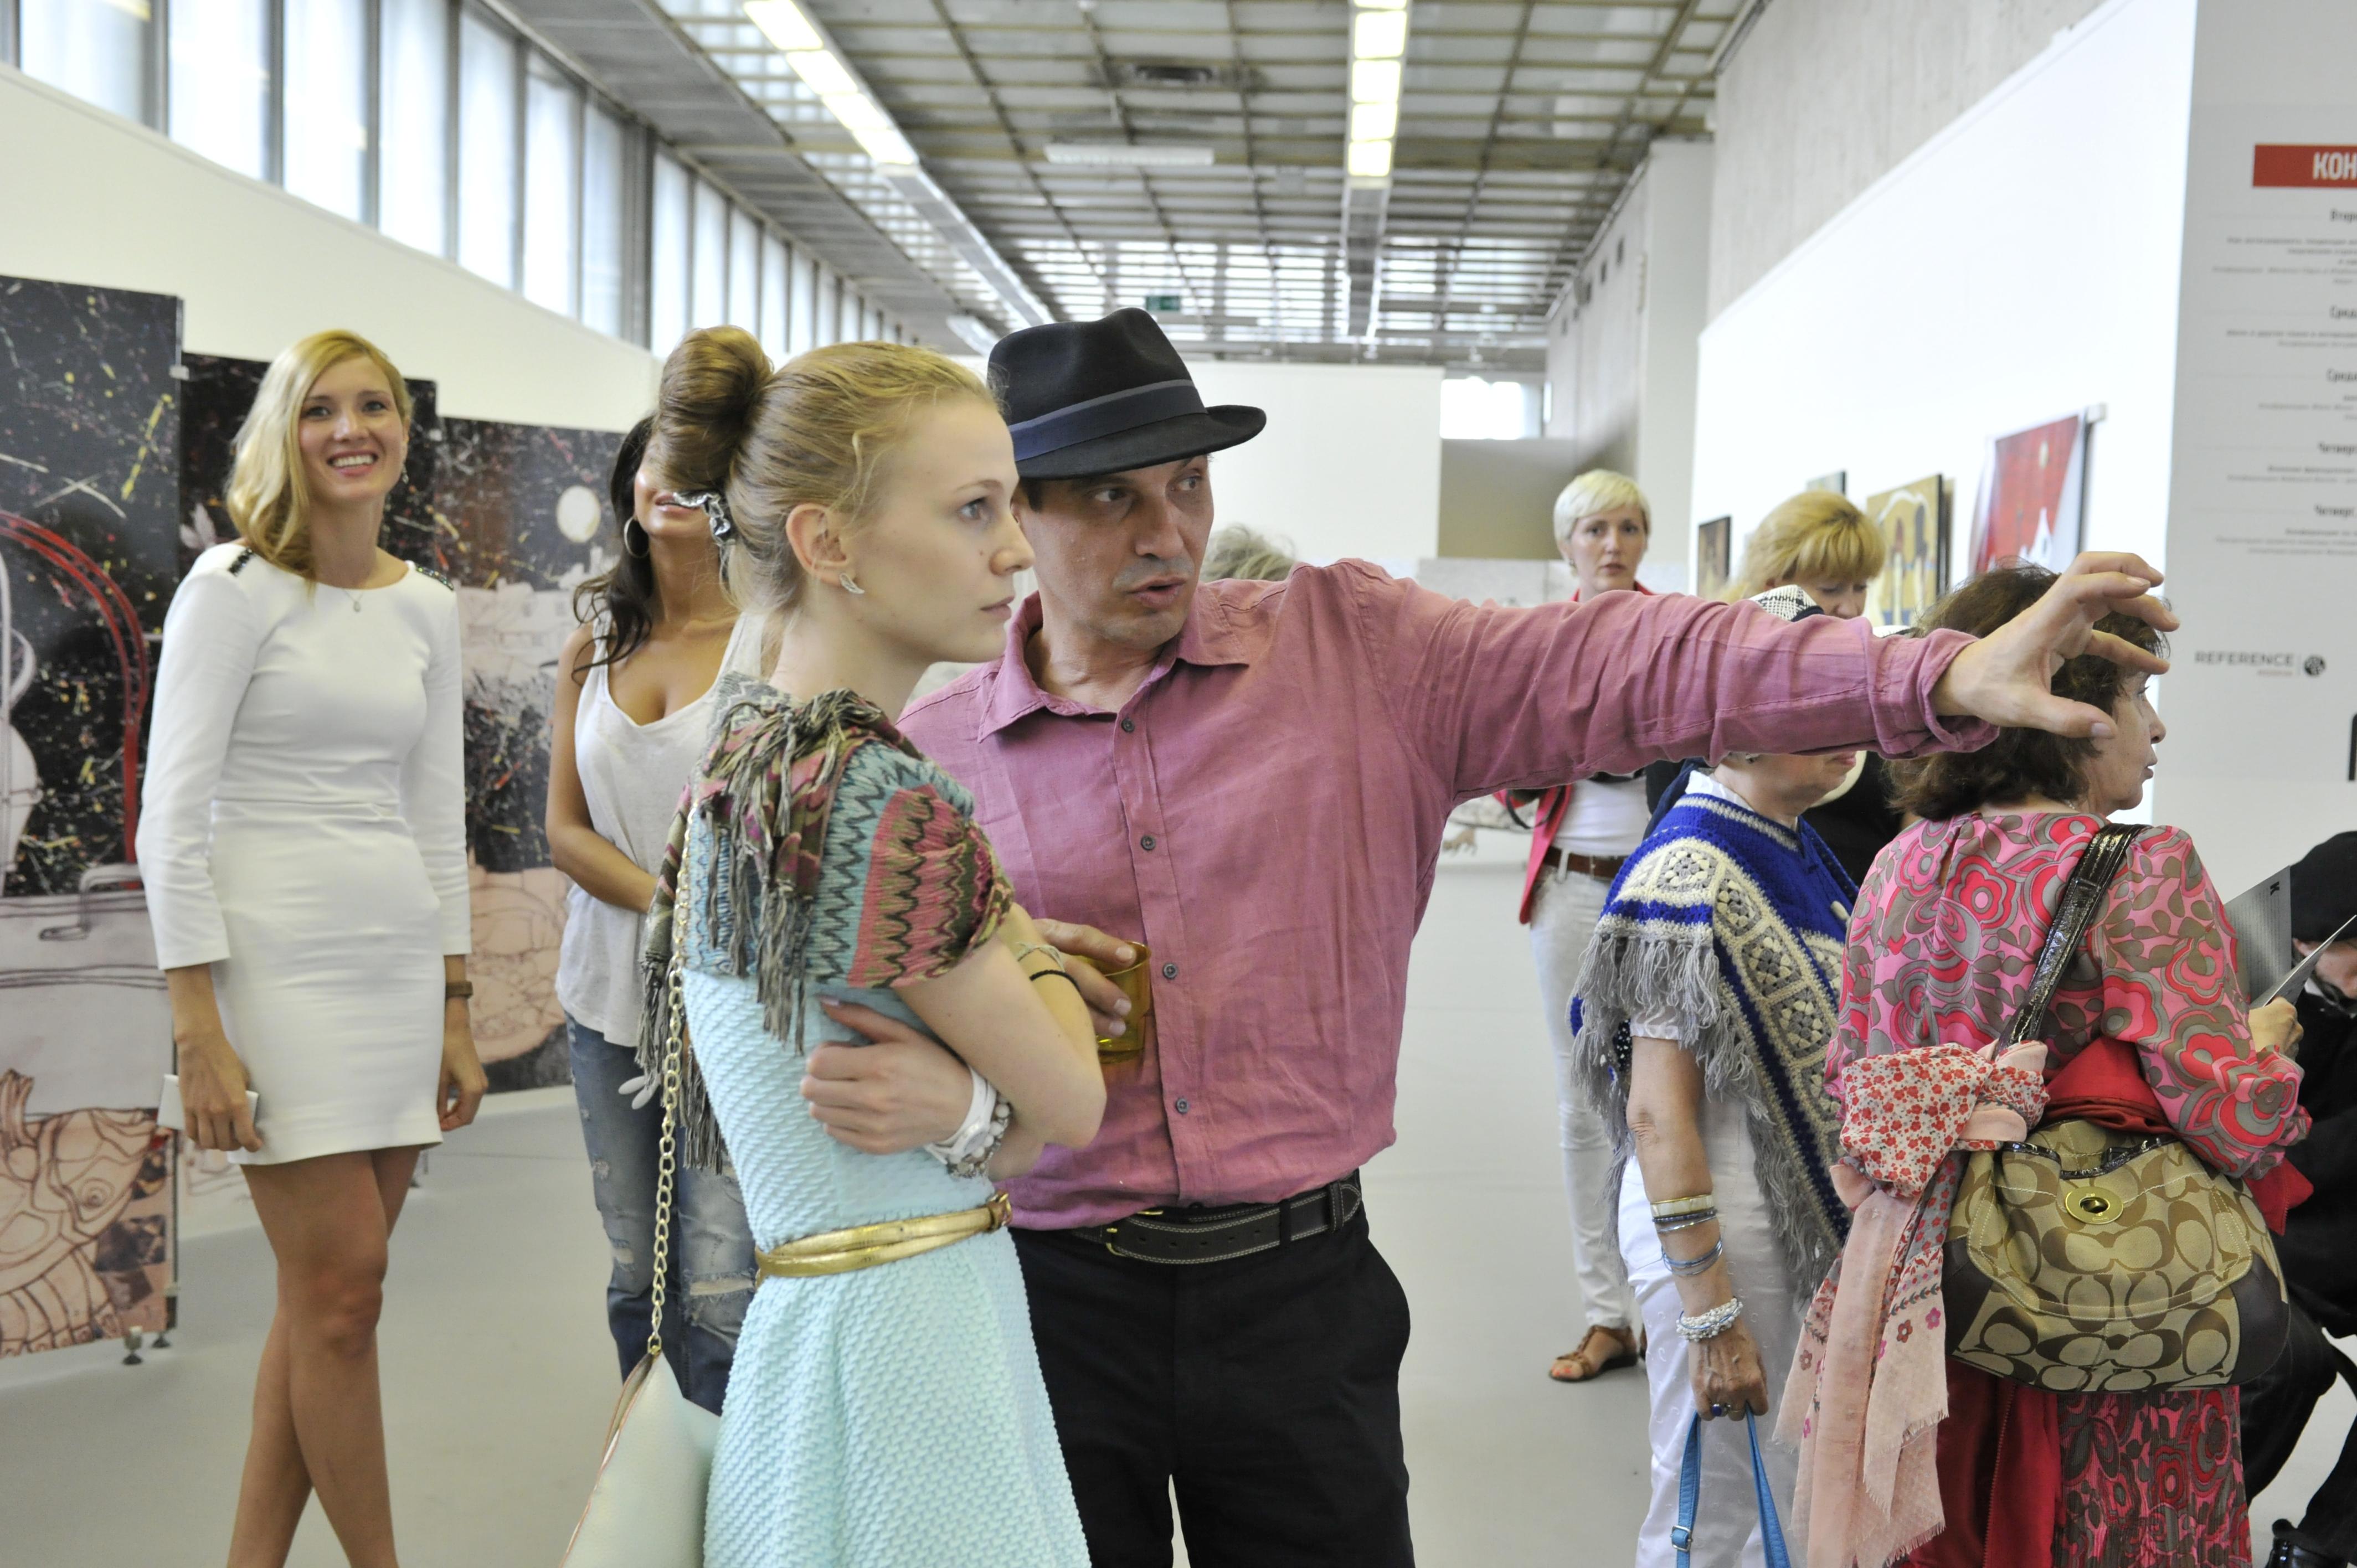 ЦДХ, МОСКВА, РОССИЯ